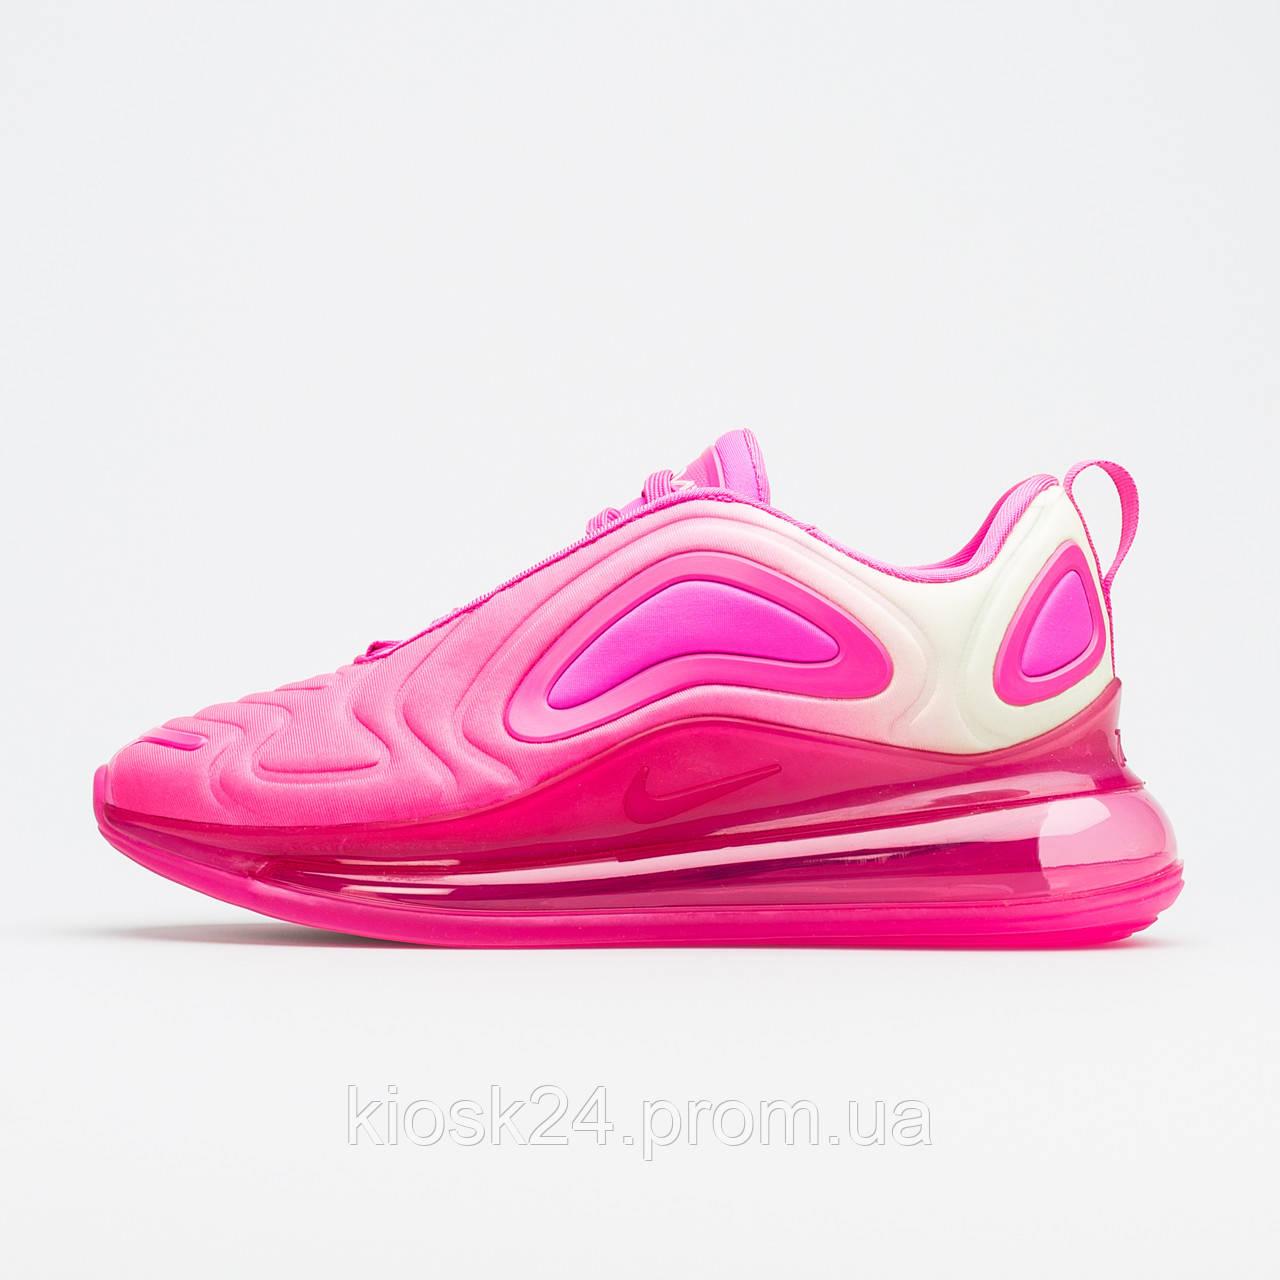 15d55abb Оригинальные кроссовки Nike Air Max 720 (GS) (AQ3195-601): продажа ...